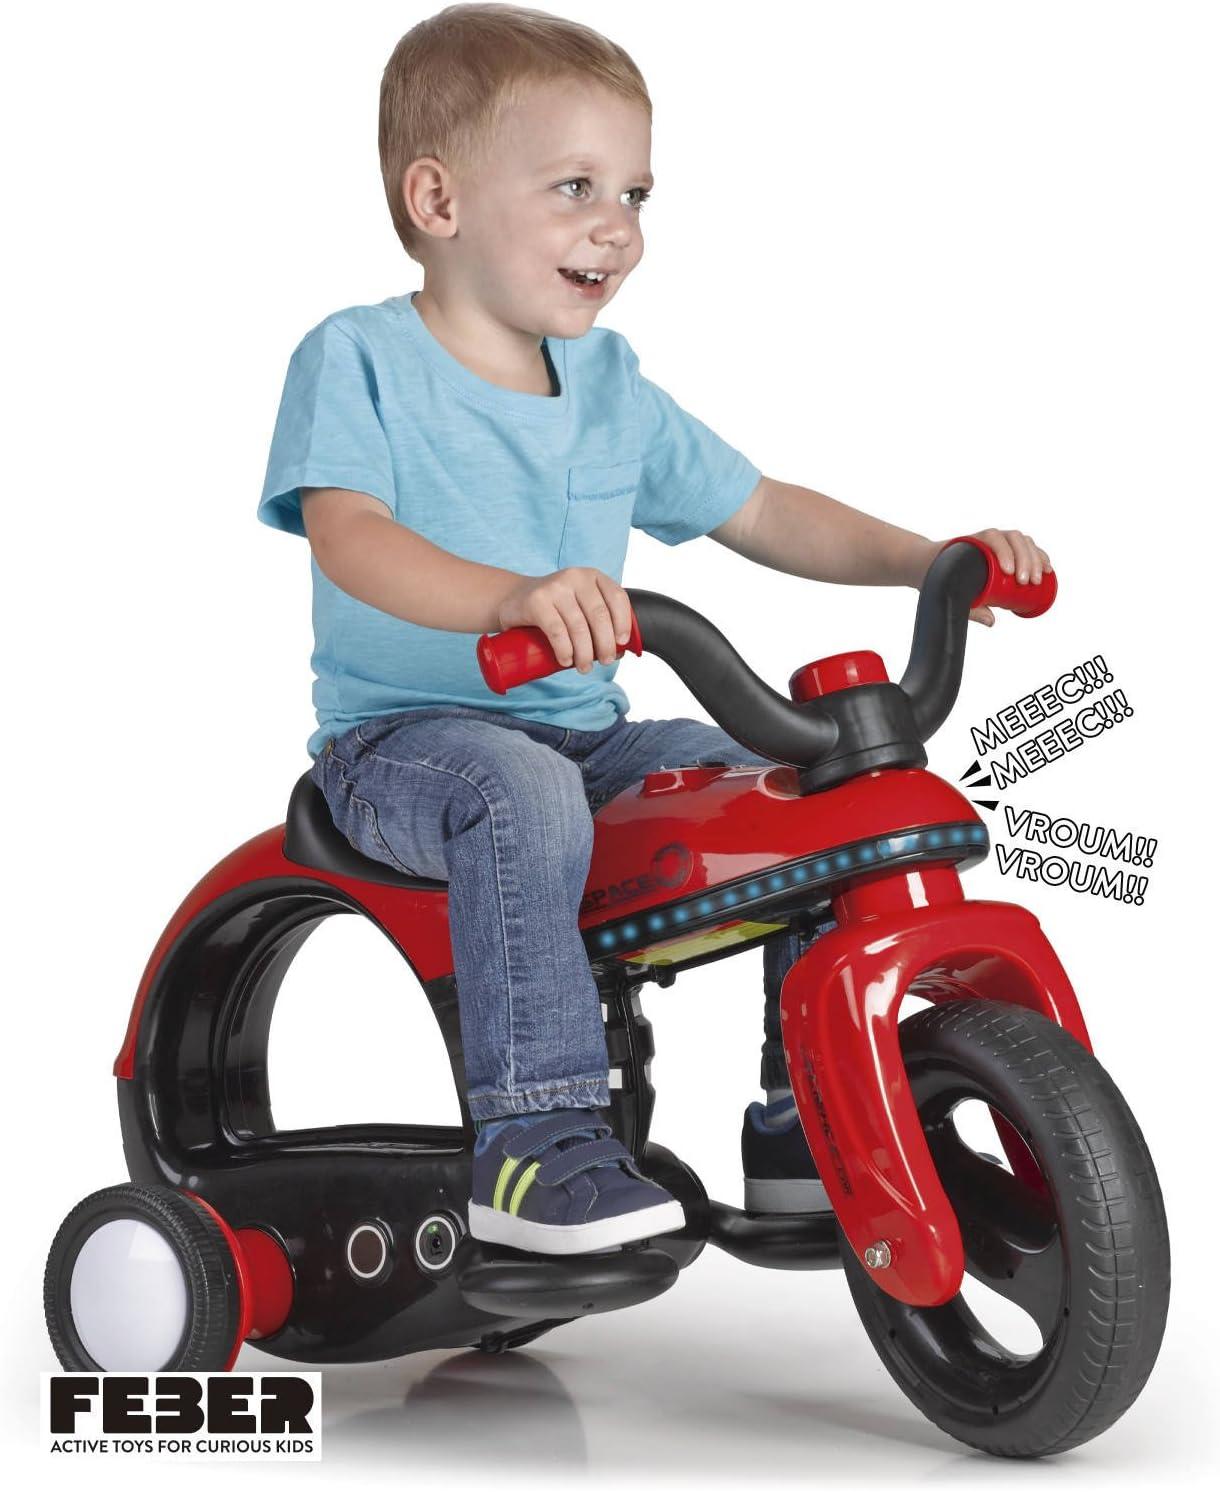 FEBER - Spacebike 6 V Moto eléctrica infantil con Luces y Sonidos (Famosa 800011898)